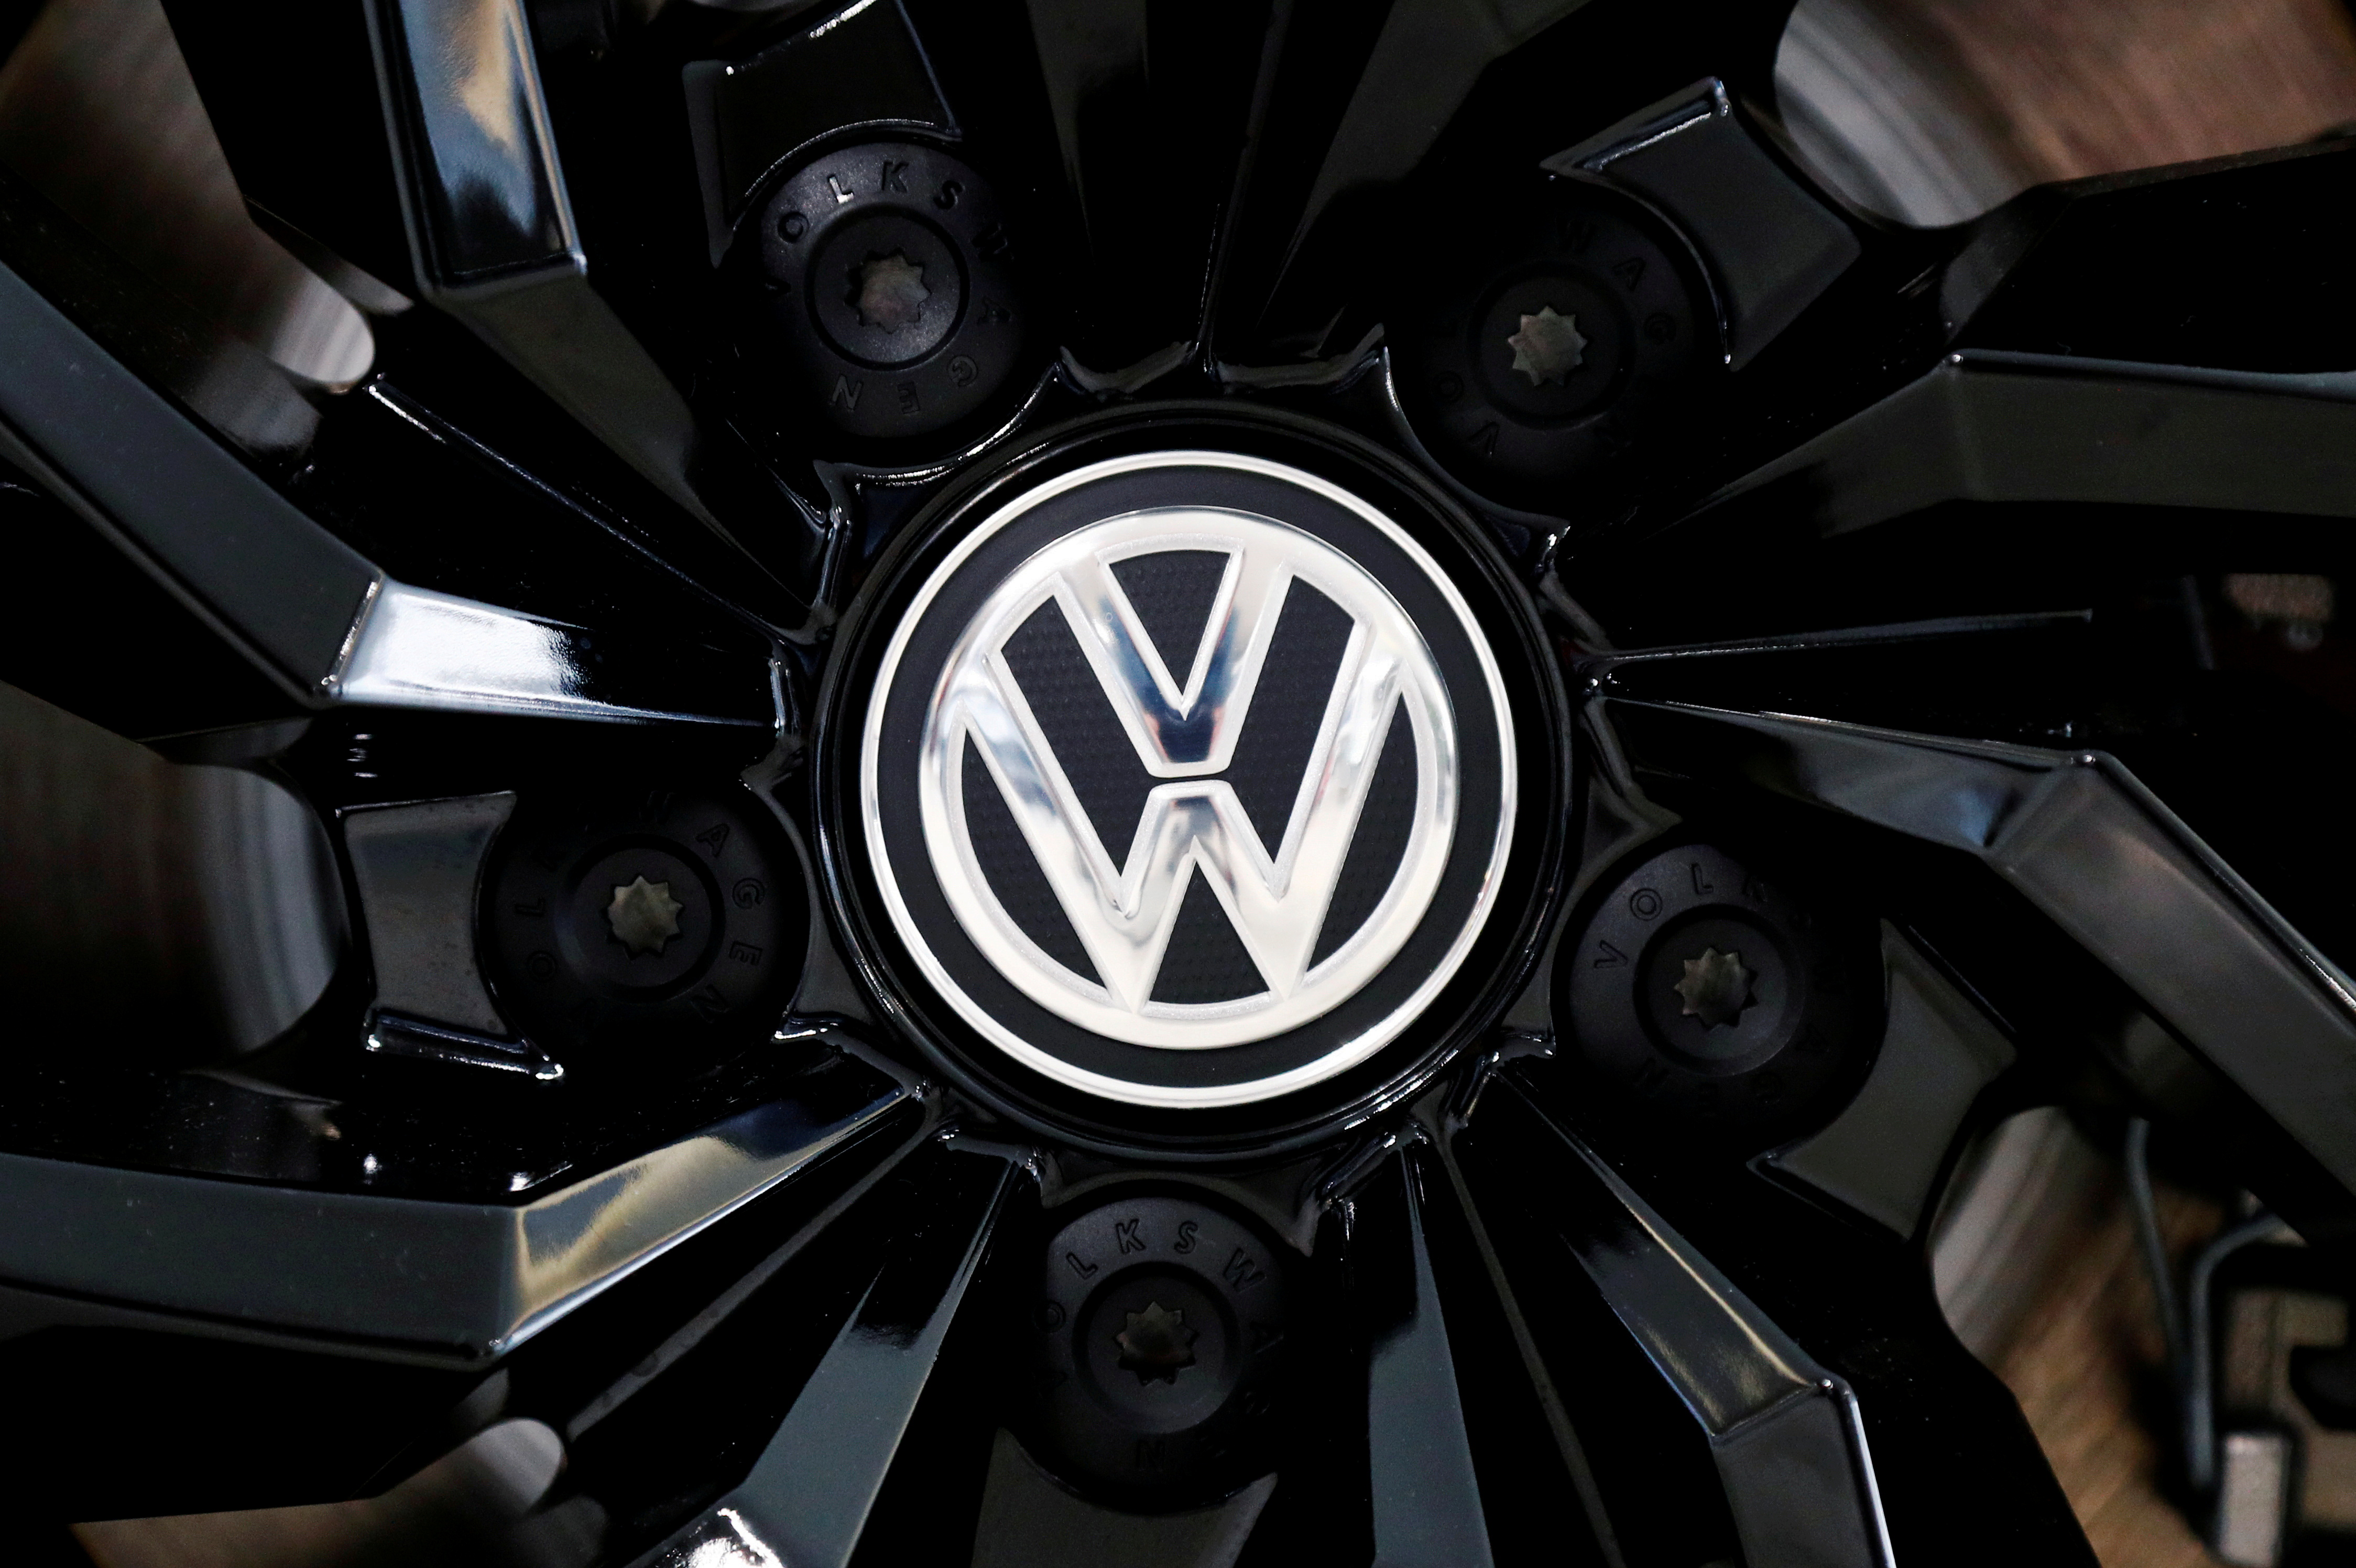 The logo of German carmaker Volkswagen is seen on a rim cap in a showroom of a Volkswagen car dealer in Brussels, Belgium July 9, 2020. REUTERS/Francois Lenoir